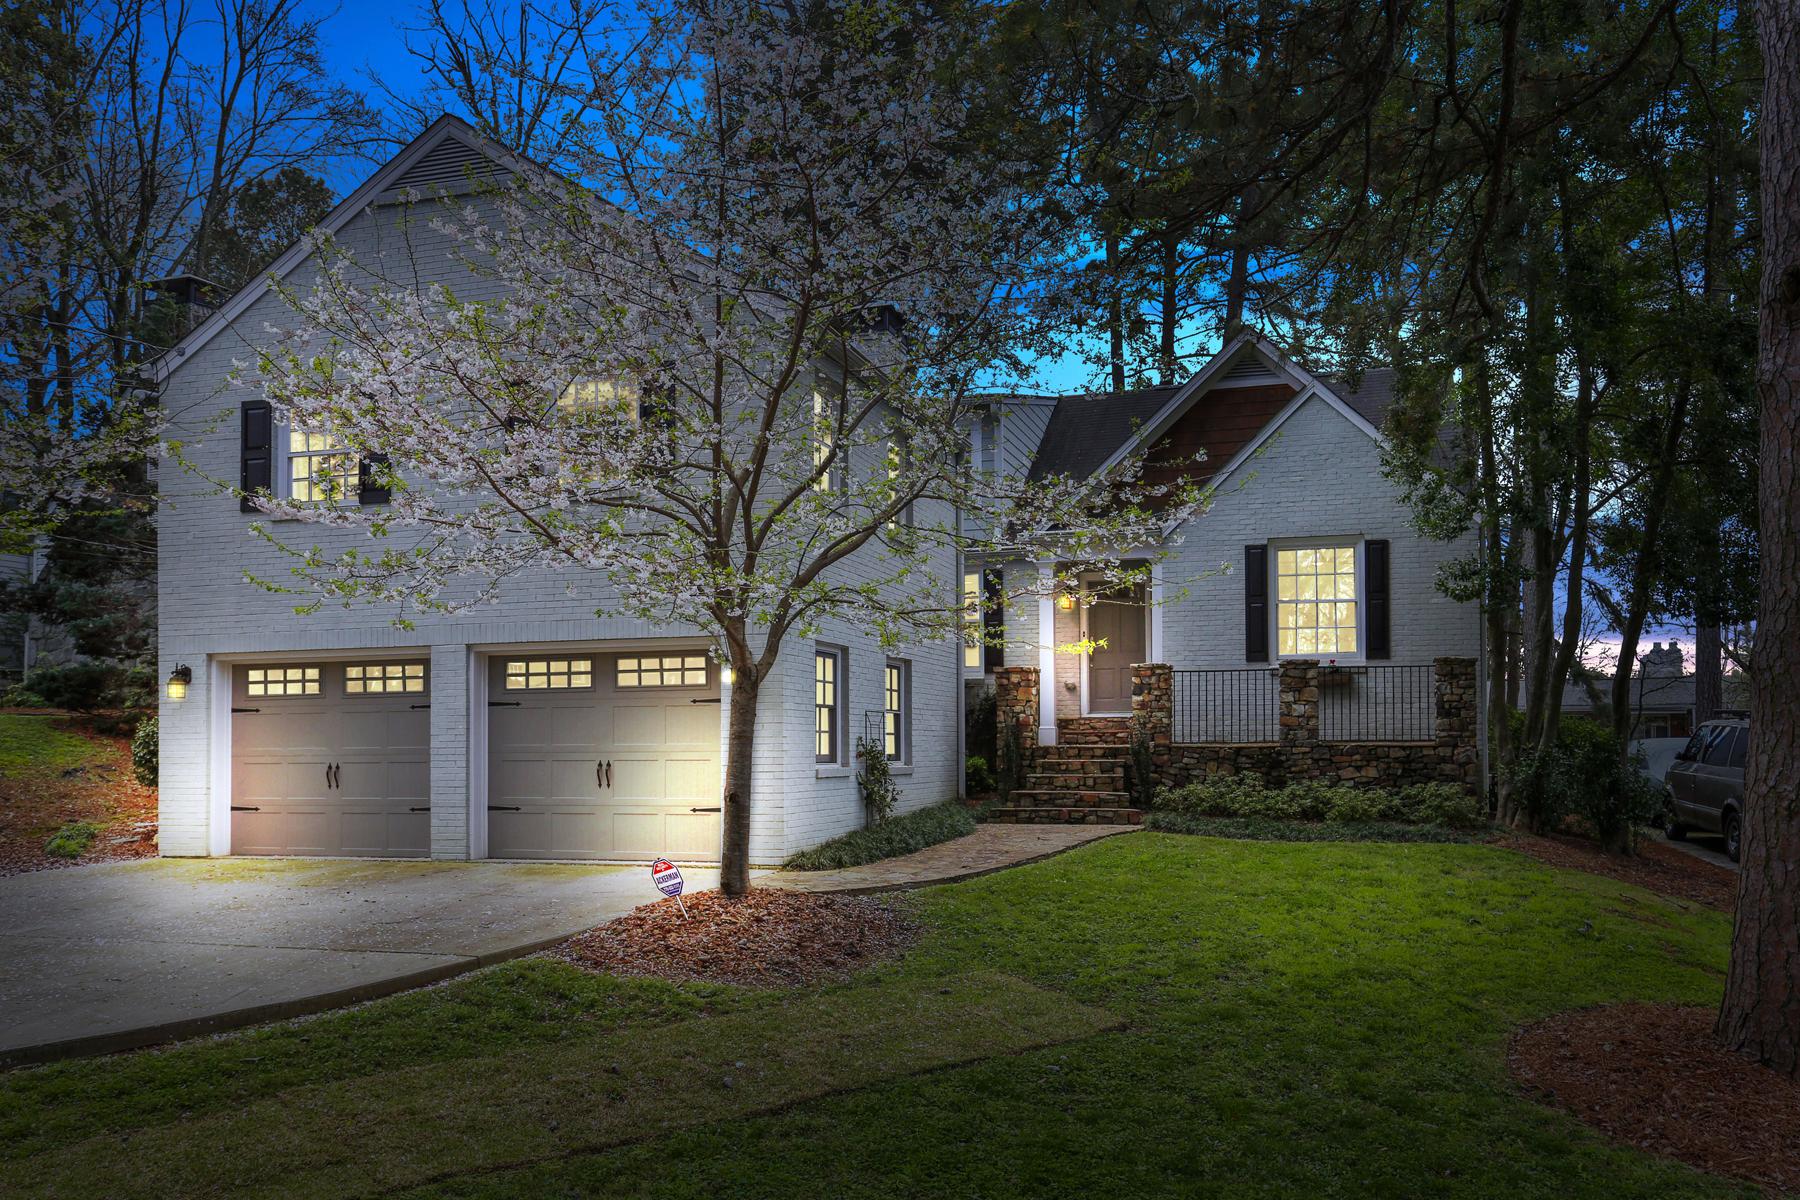 واحد منزل الأسرة للـ Sale في Morningside Living At Its Finest 627 Hillpine Drive NE, Morningside, Atlanta, Georgia, 30306 United States